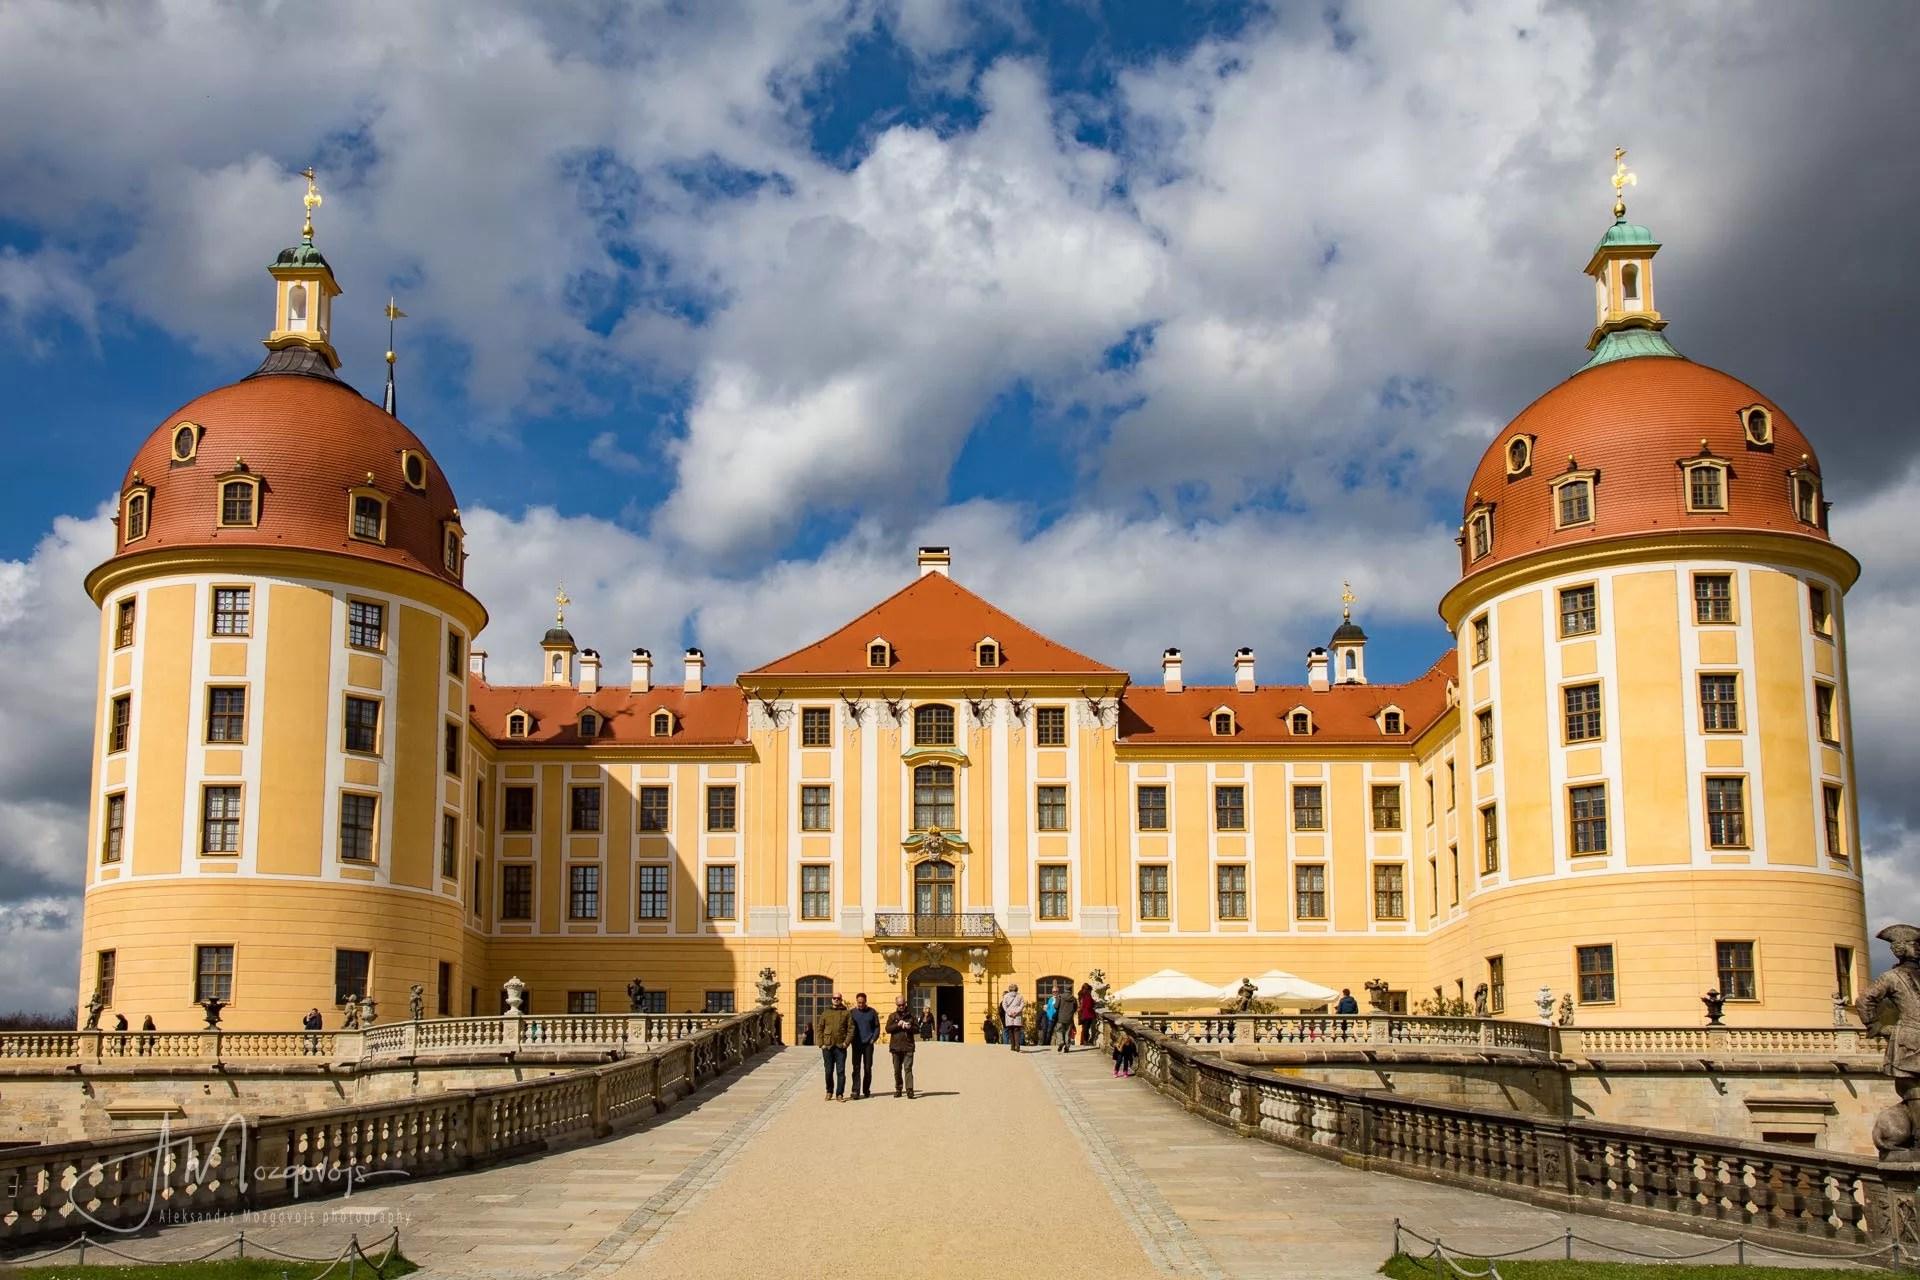 Entryway to castle Moritzburg